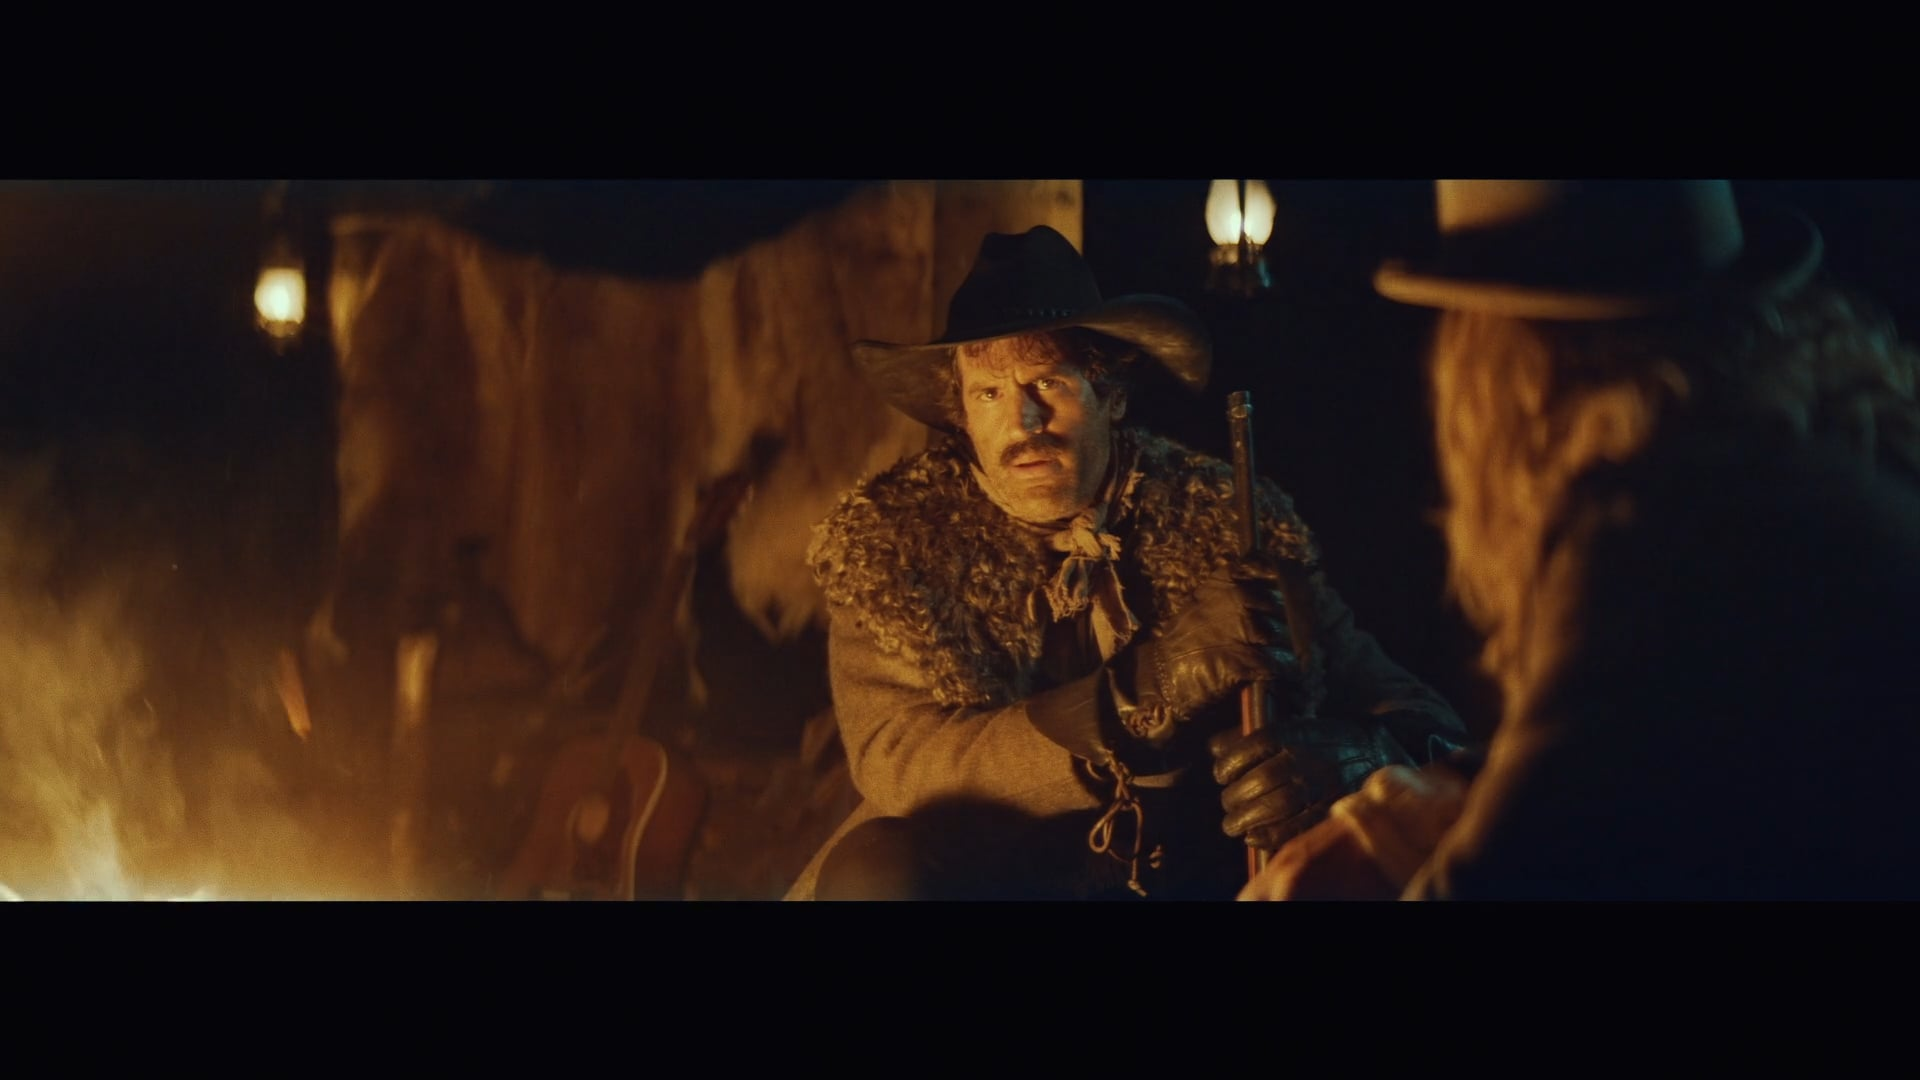 Stofa / Cowboy